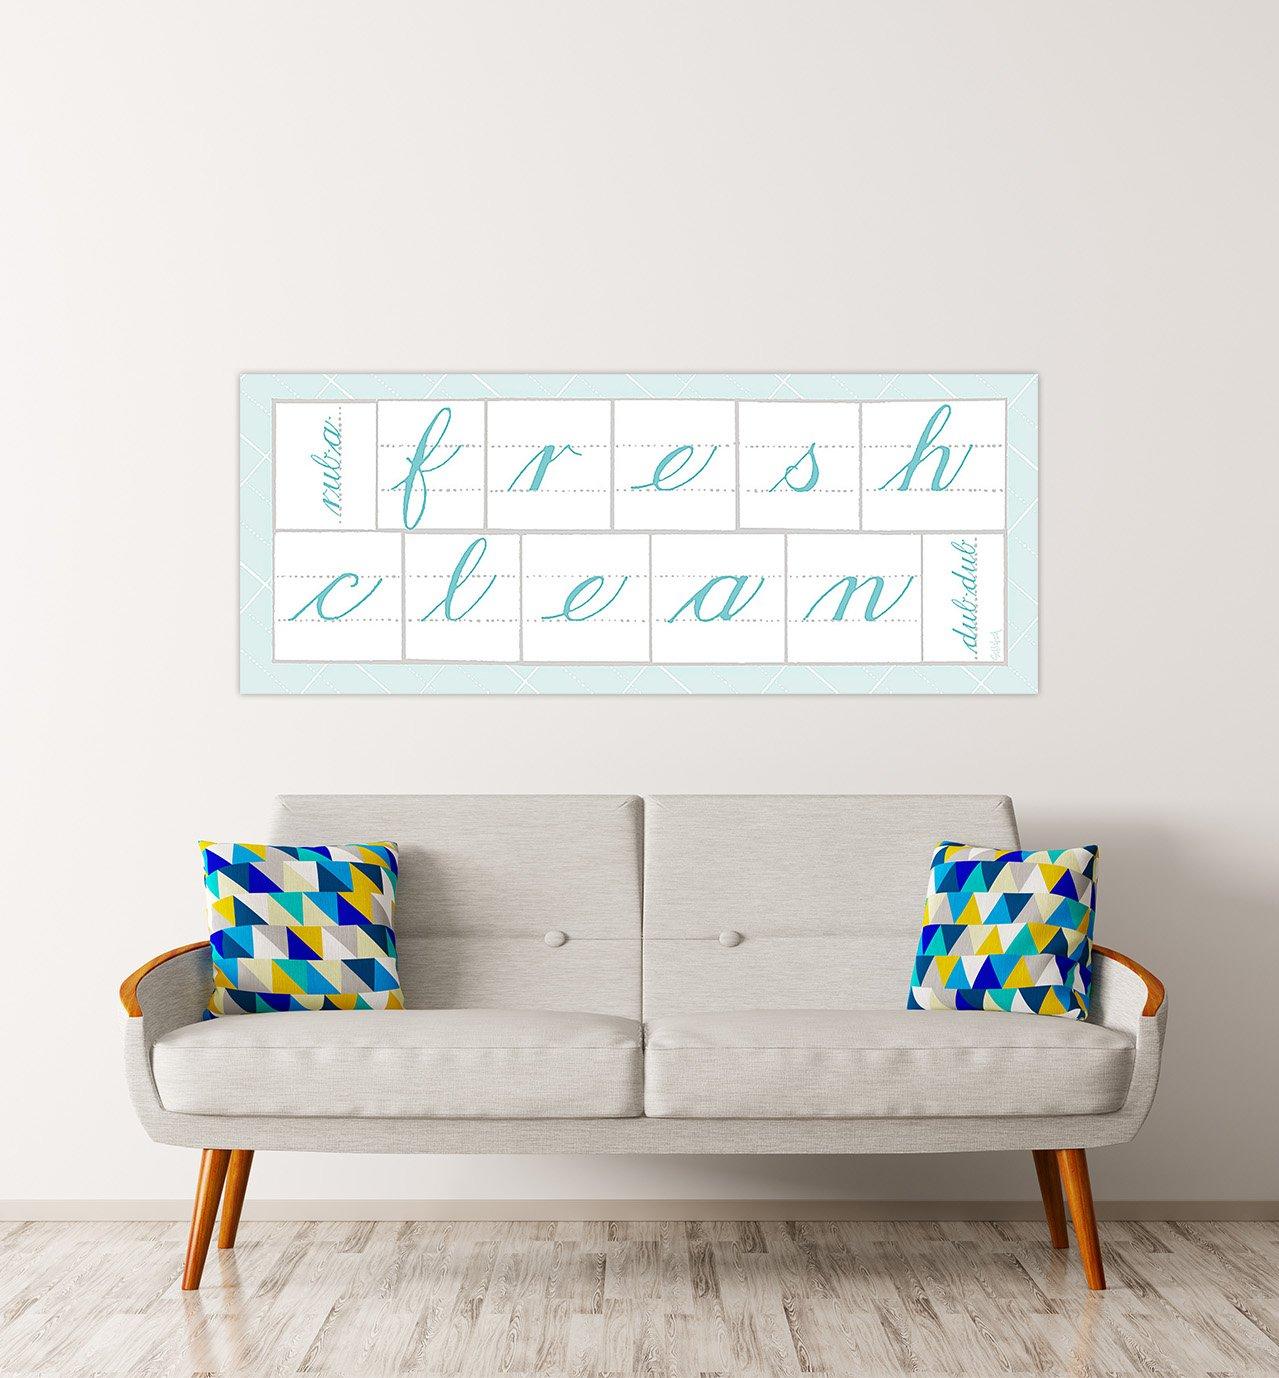 DìMò ART Bild Druck auf Leinwand Leinwand Leinwand mit Rahmen in Holz Schlabach Sue Fresh Clean Blau 175x70 cm 175x70 cm B07DYMSZ8W | Neuheit Spielzeug  e93fa9